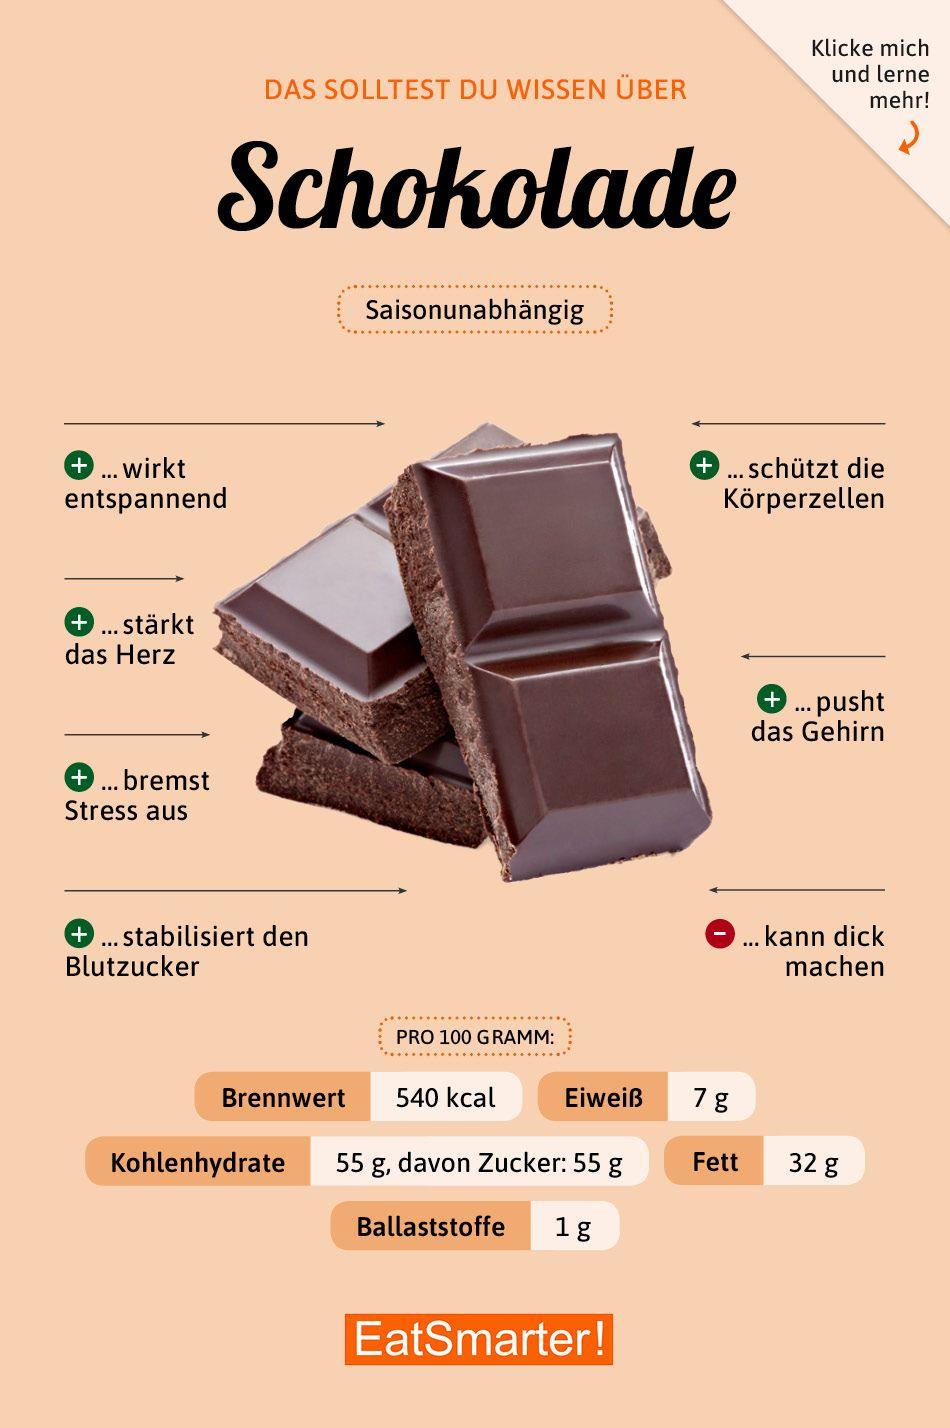 Schokolade | eatsmarter.de #ernährung #infografik #schokolade